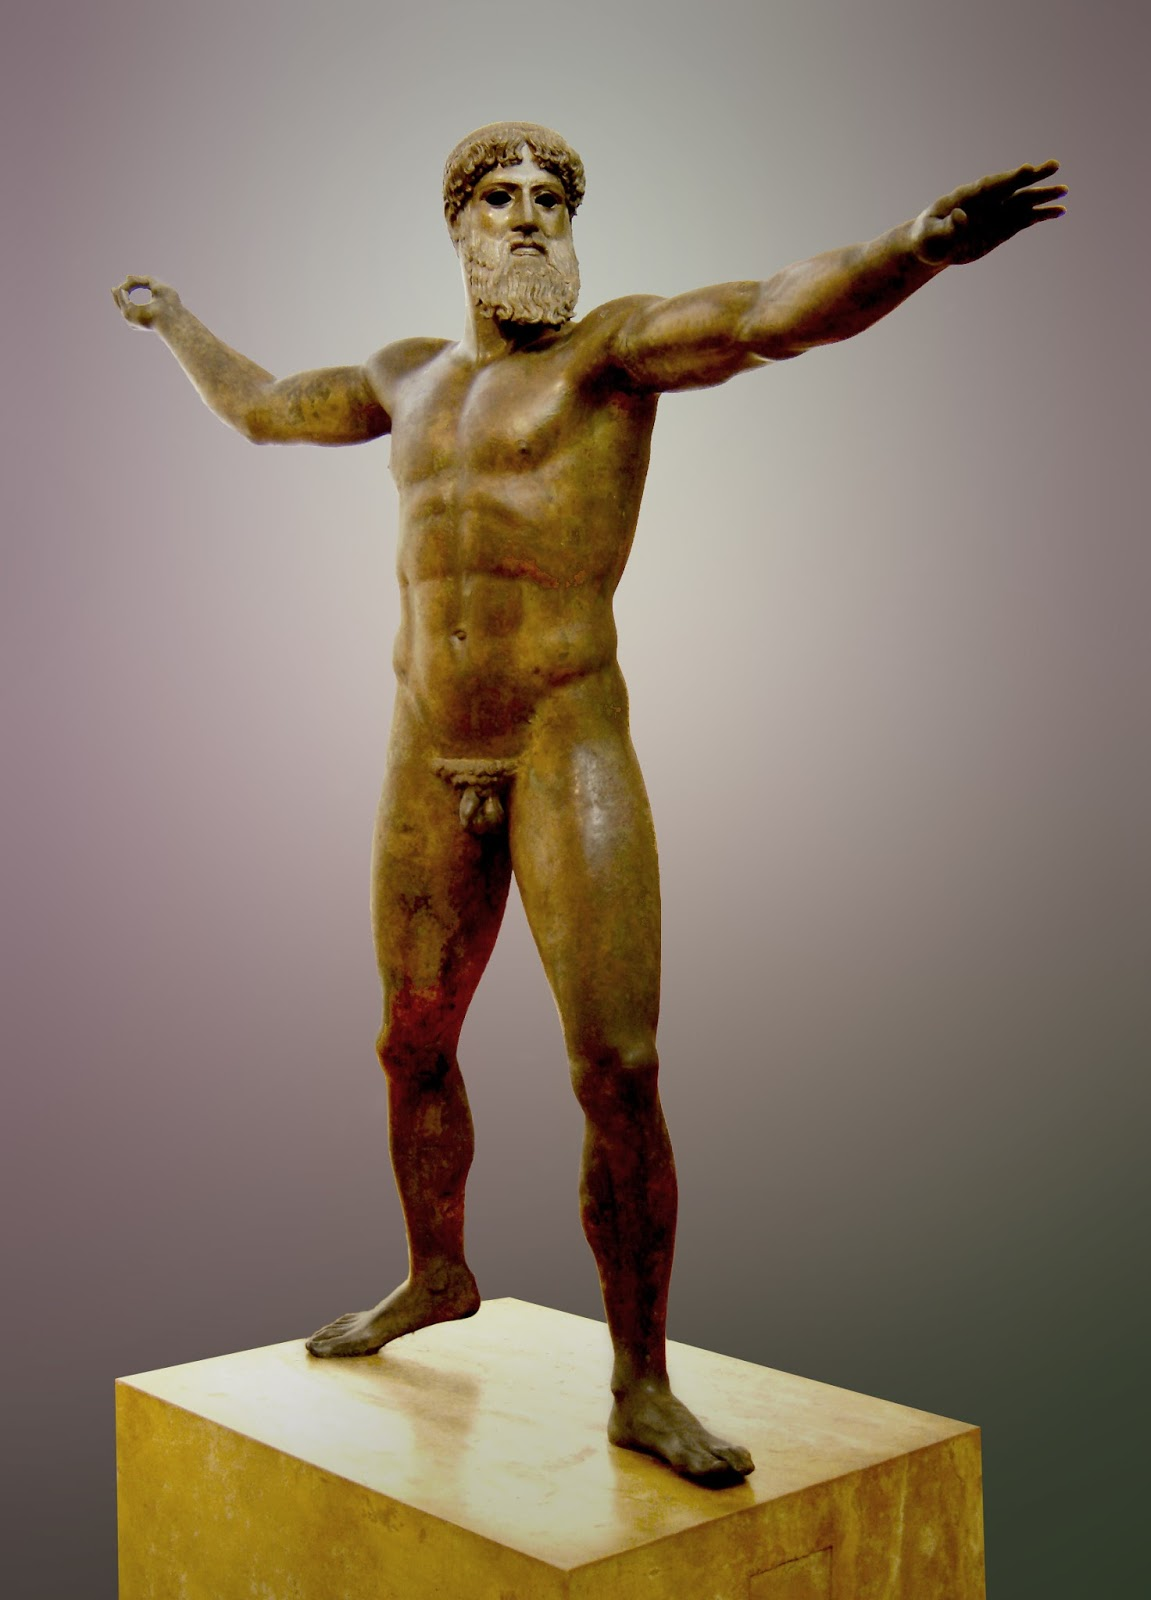 klassisk skulptur